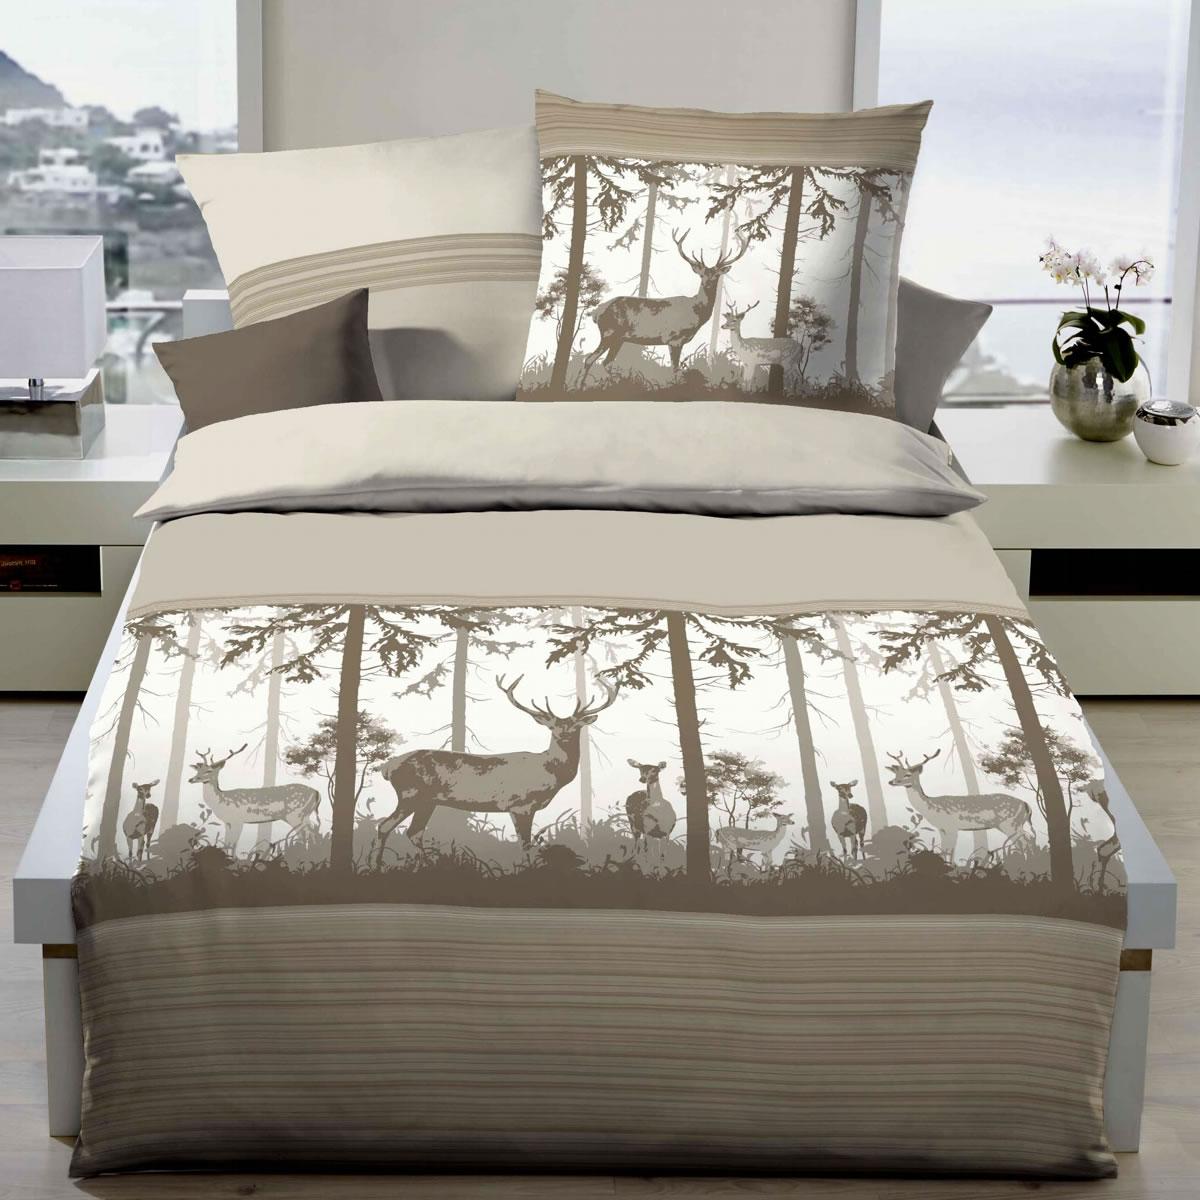 kaeppel biber bettw sche 155x220 cm design 67836 deep forest mandel. Black Bedroom Furniture Sets. Home Design Ideas